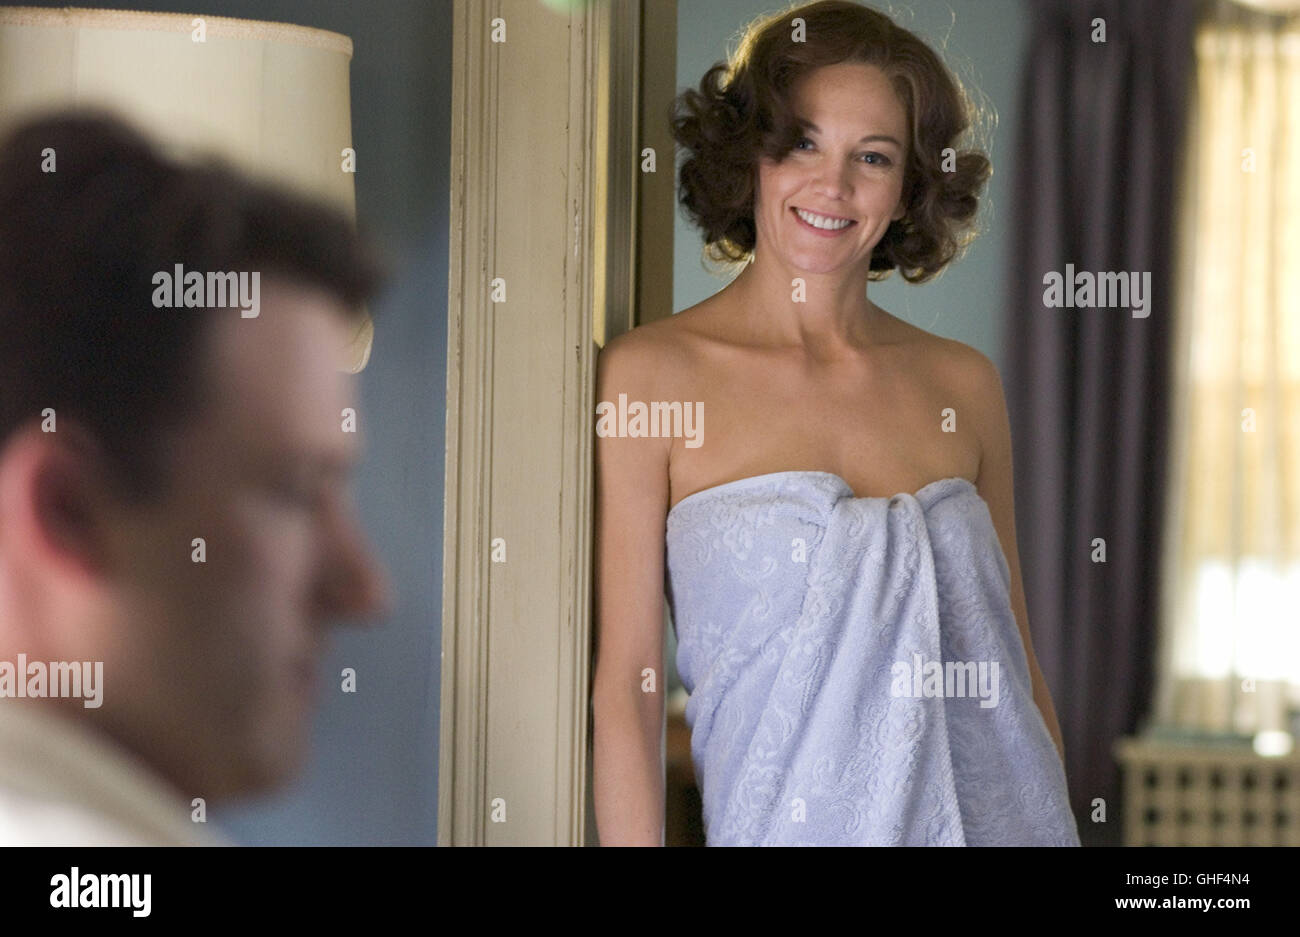 Jonathan Frid,Saskia Reeves (born 1961) Hot pics & movies Francelia Billington,Zsa Zsa Padilla (b. 1964)